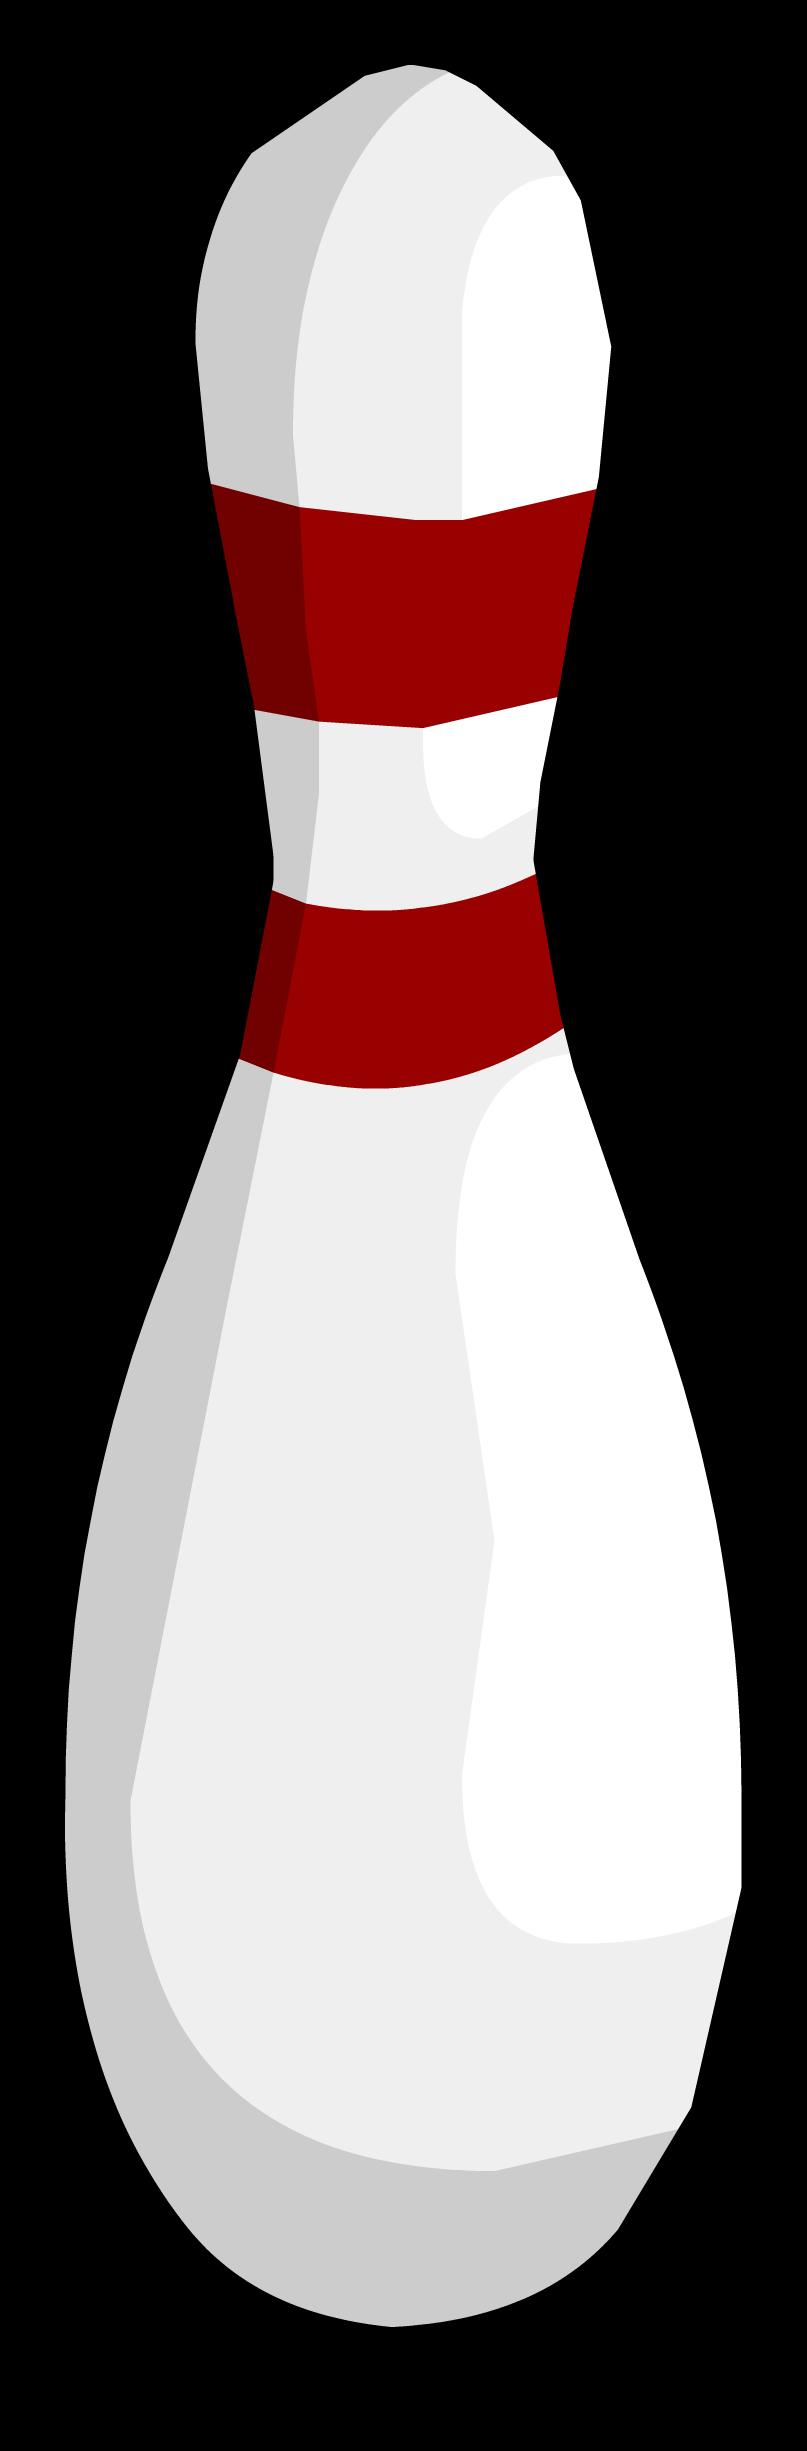 807x2451 Bowling Pin Club Penguin Wiki Fandom Powered By Wikia